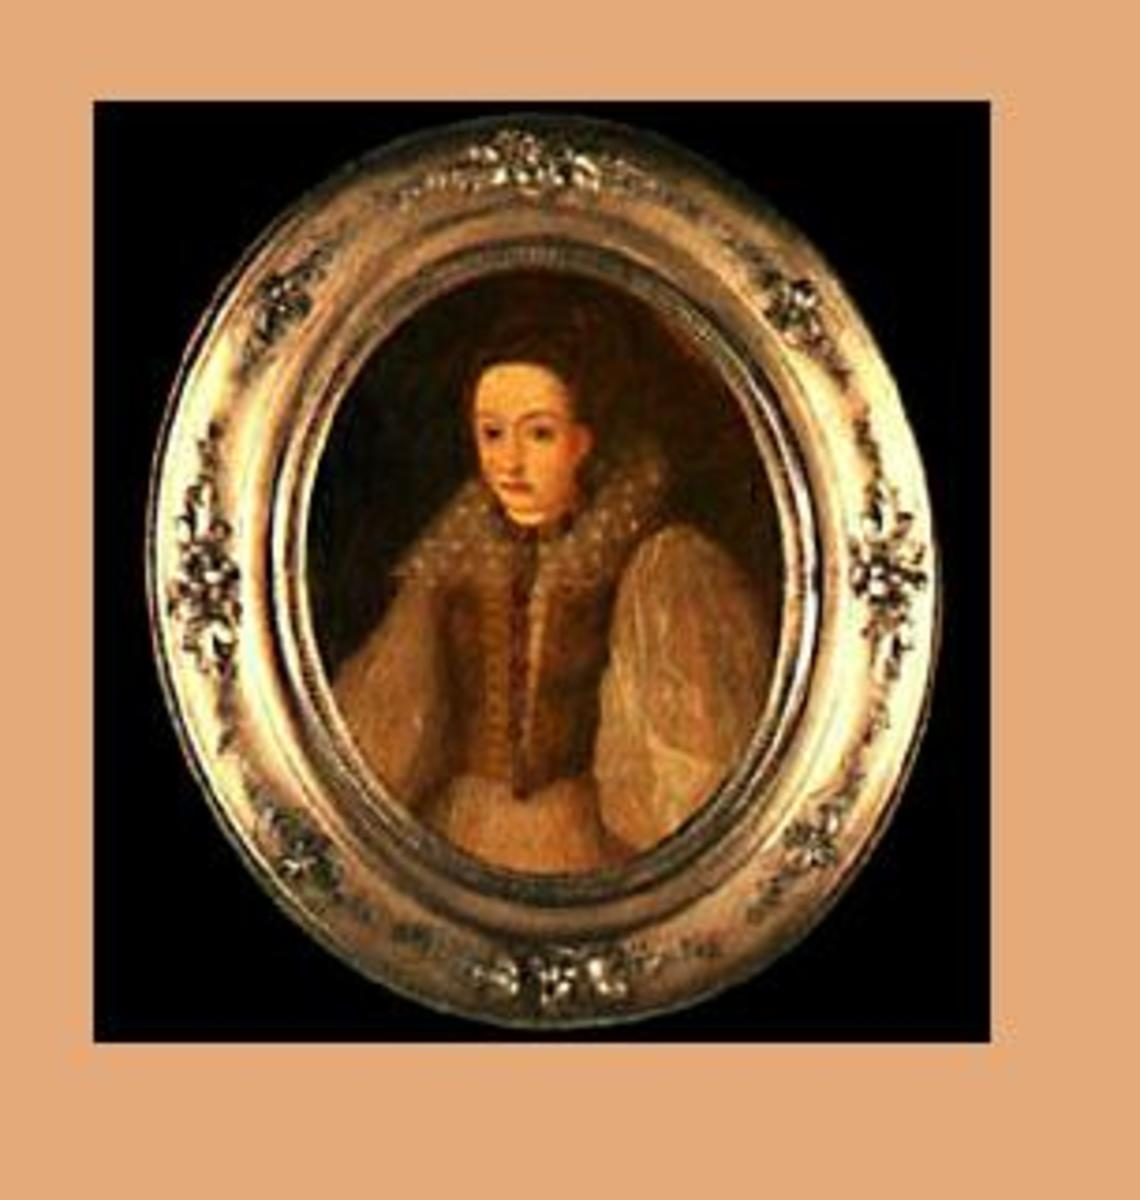 Hungarian Countess Elizabeth Bathory, AKA: The Blood Countess